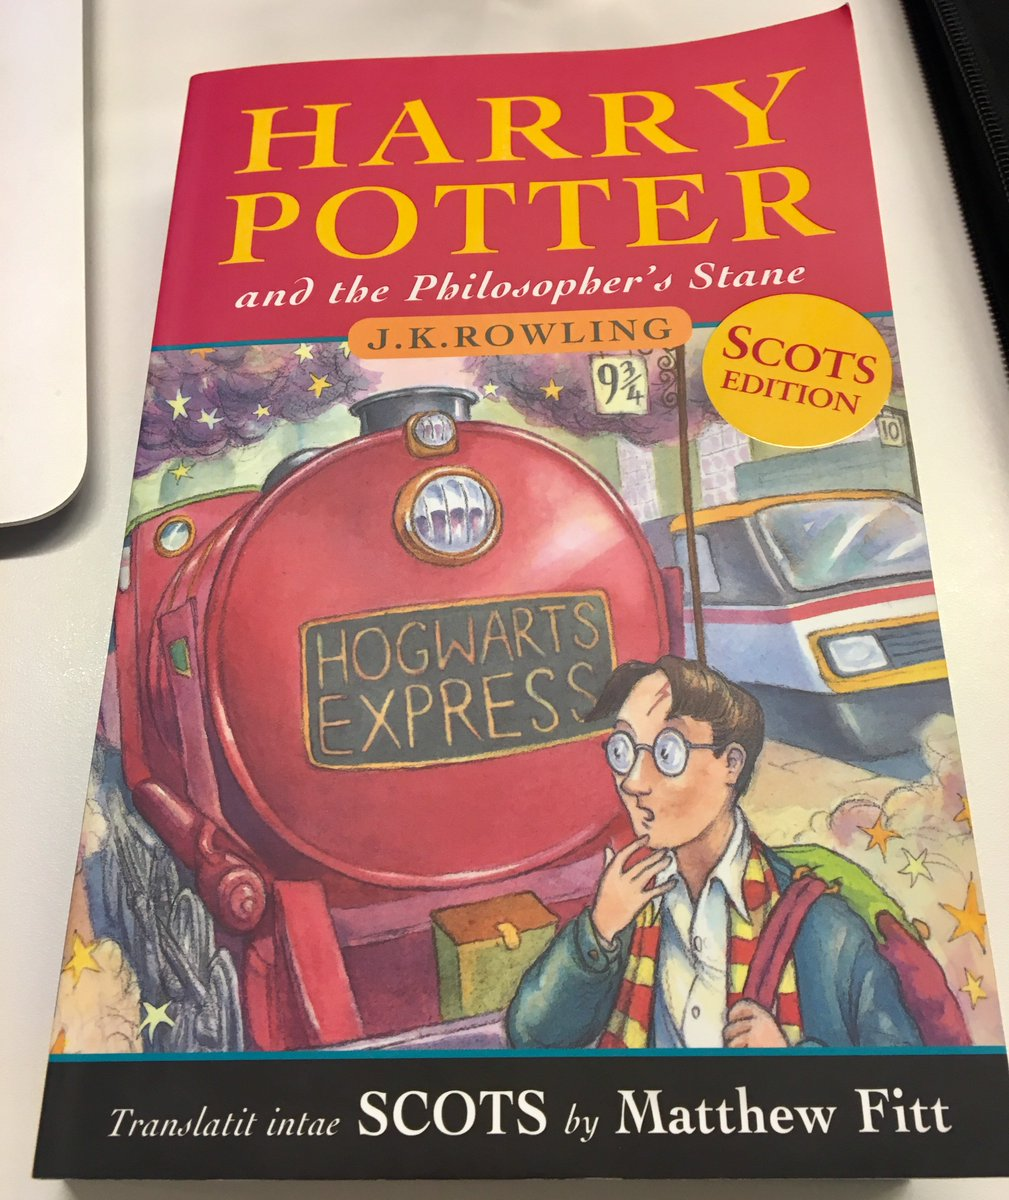 Woop woop! Happy Publication day @bwpublishing! @ElMirette #80languages #HarryPotter20  <br>http://pic.twitter.com/FK9PvKTpTi